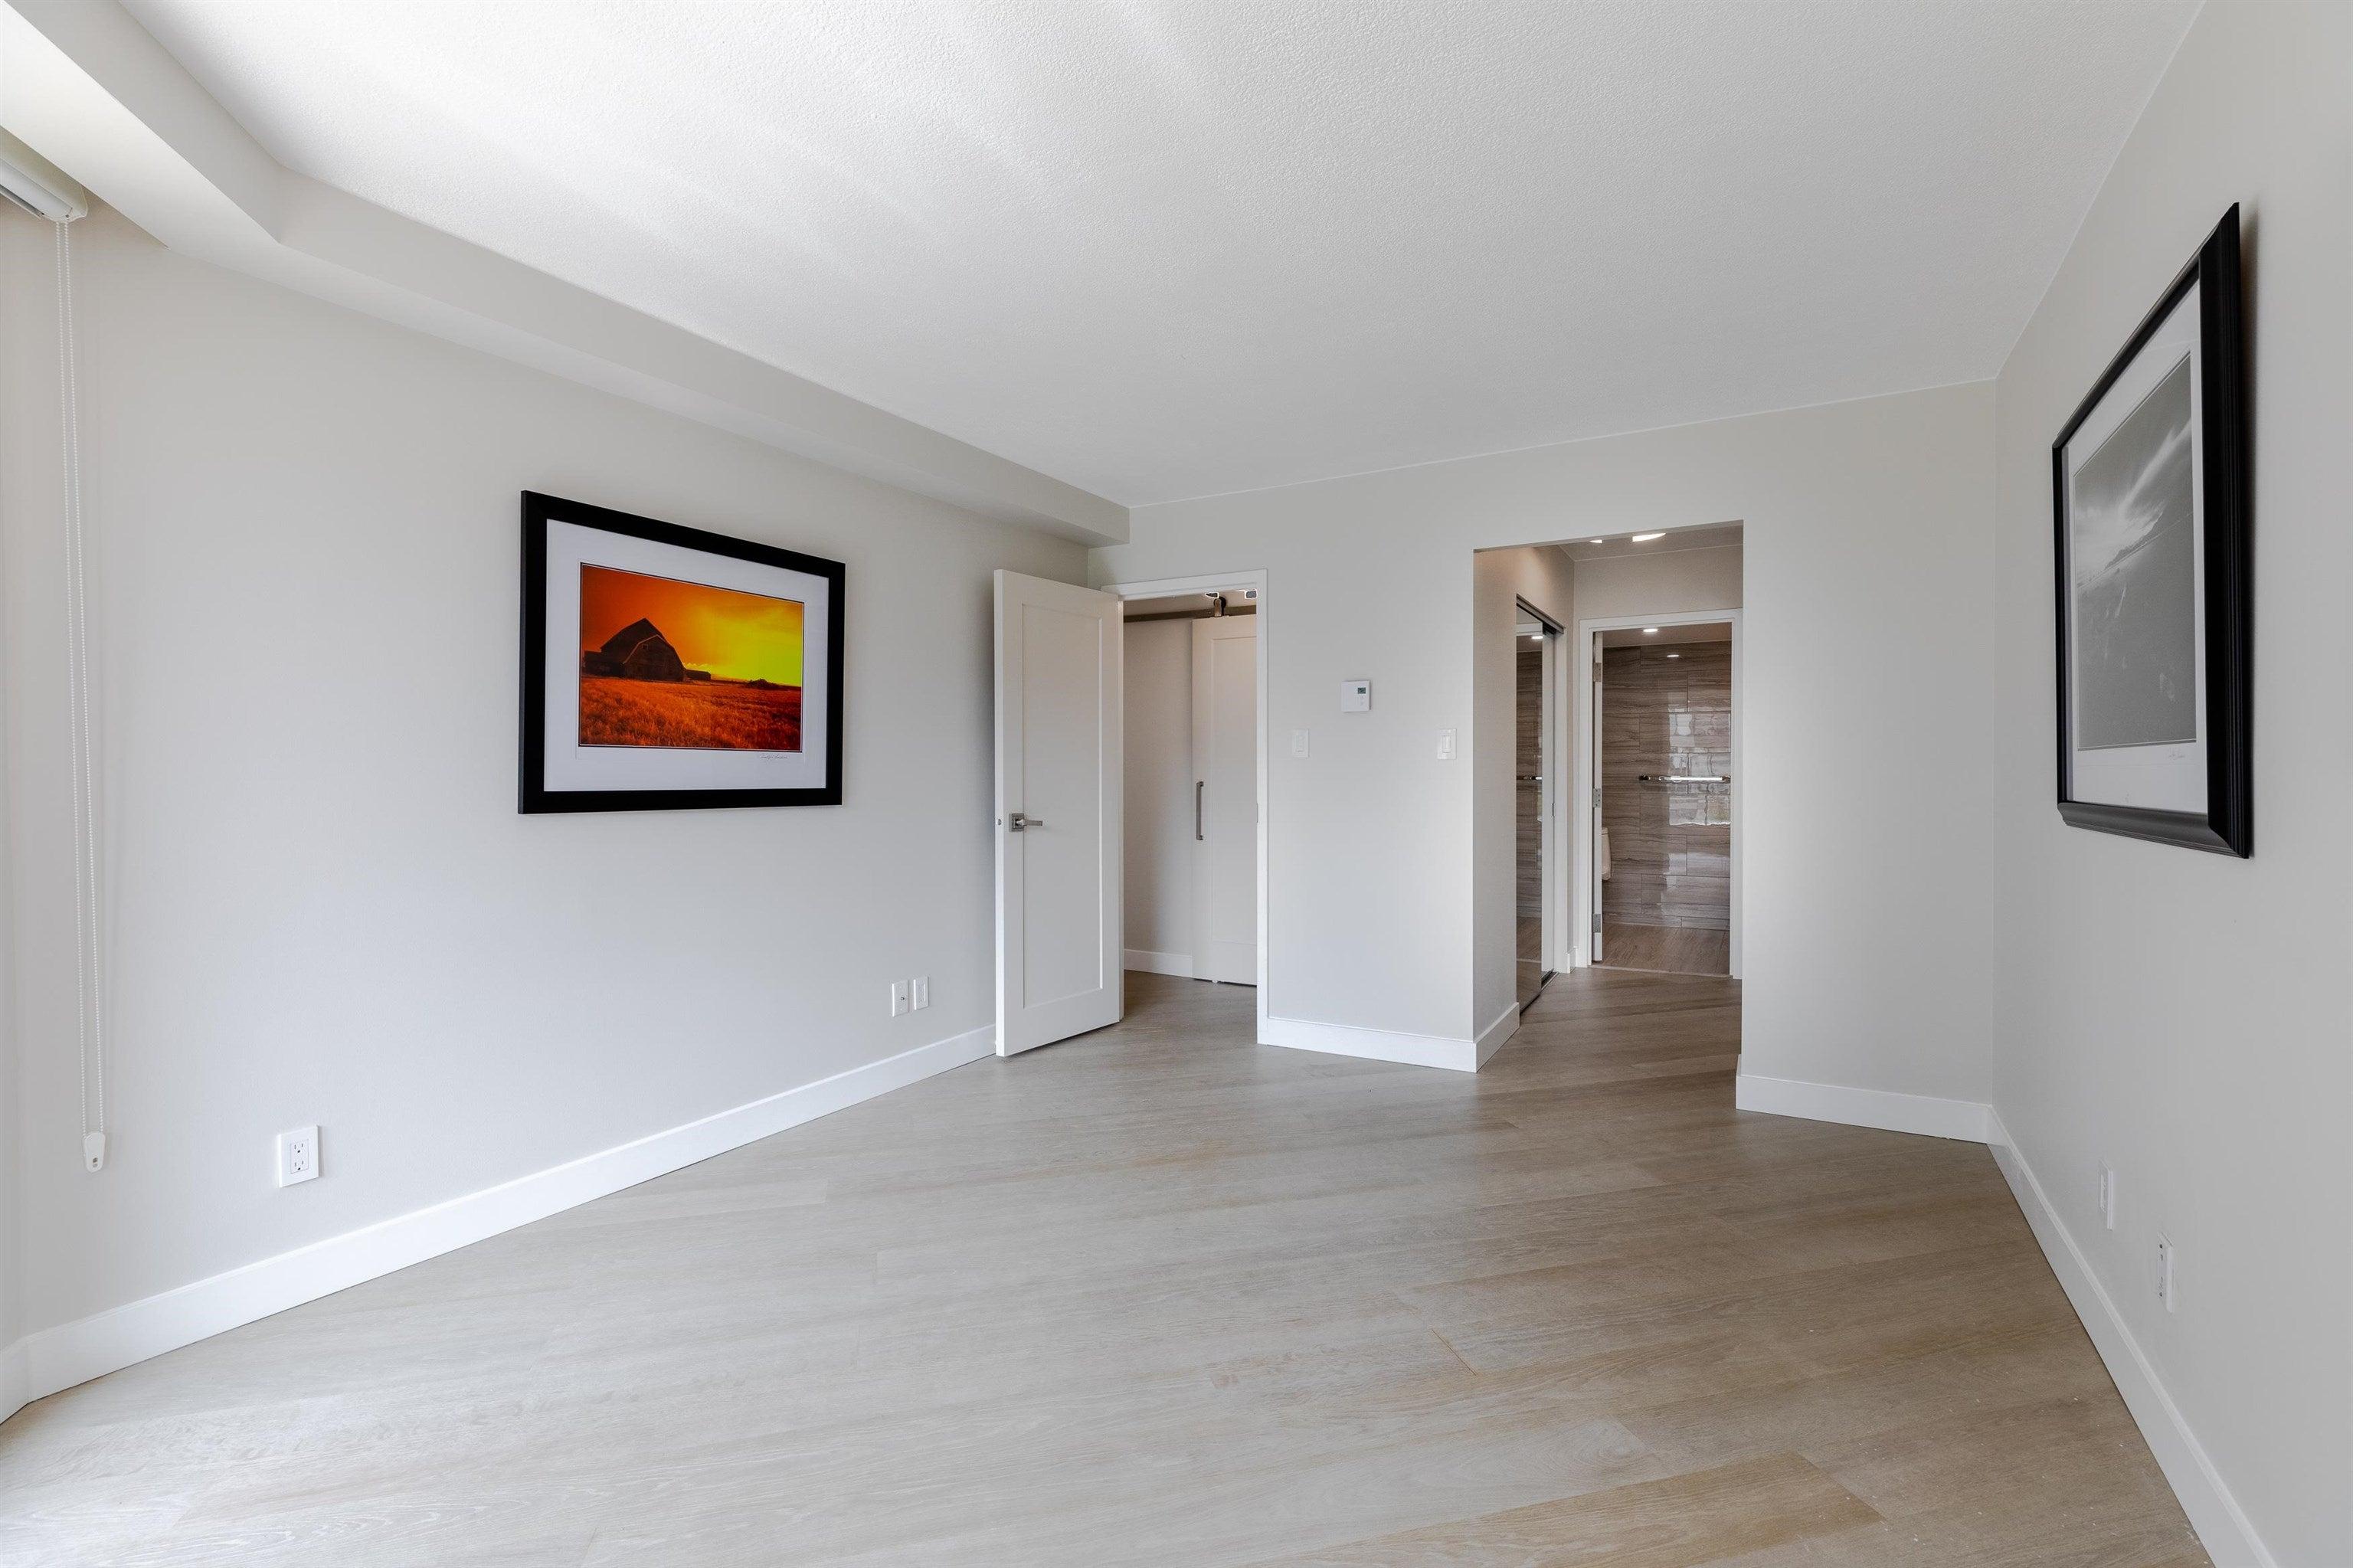 406 1450 PENNYFARTHING DRIVE - False Creek Apartment/Condo for sale, 2 Bedrooms (R2617259) - #25